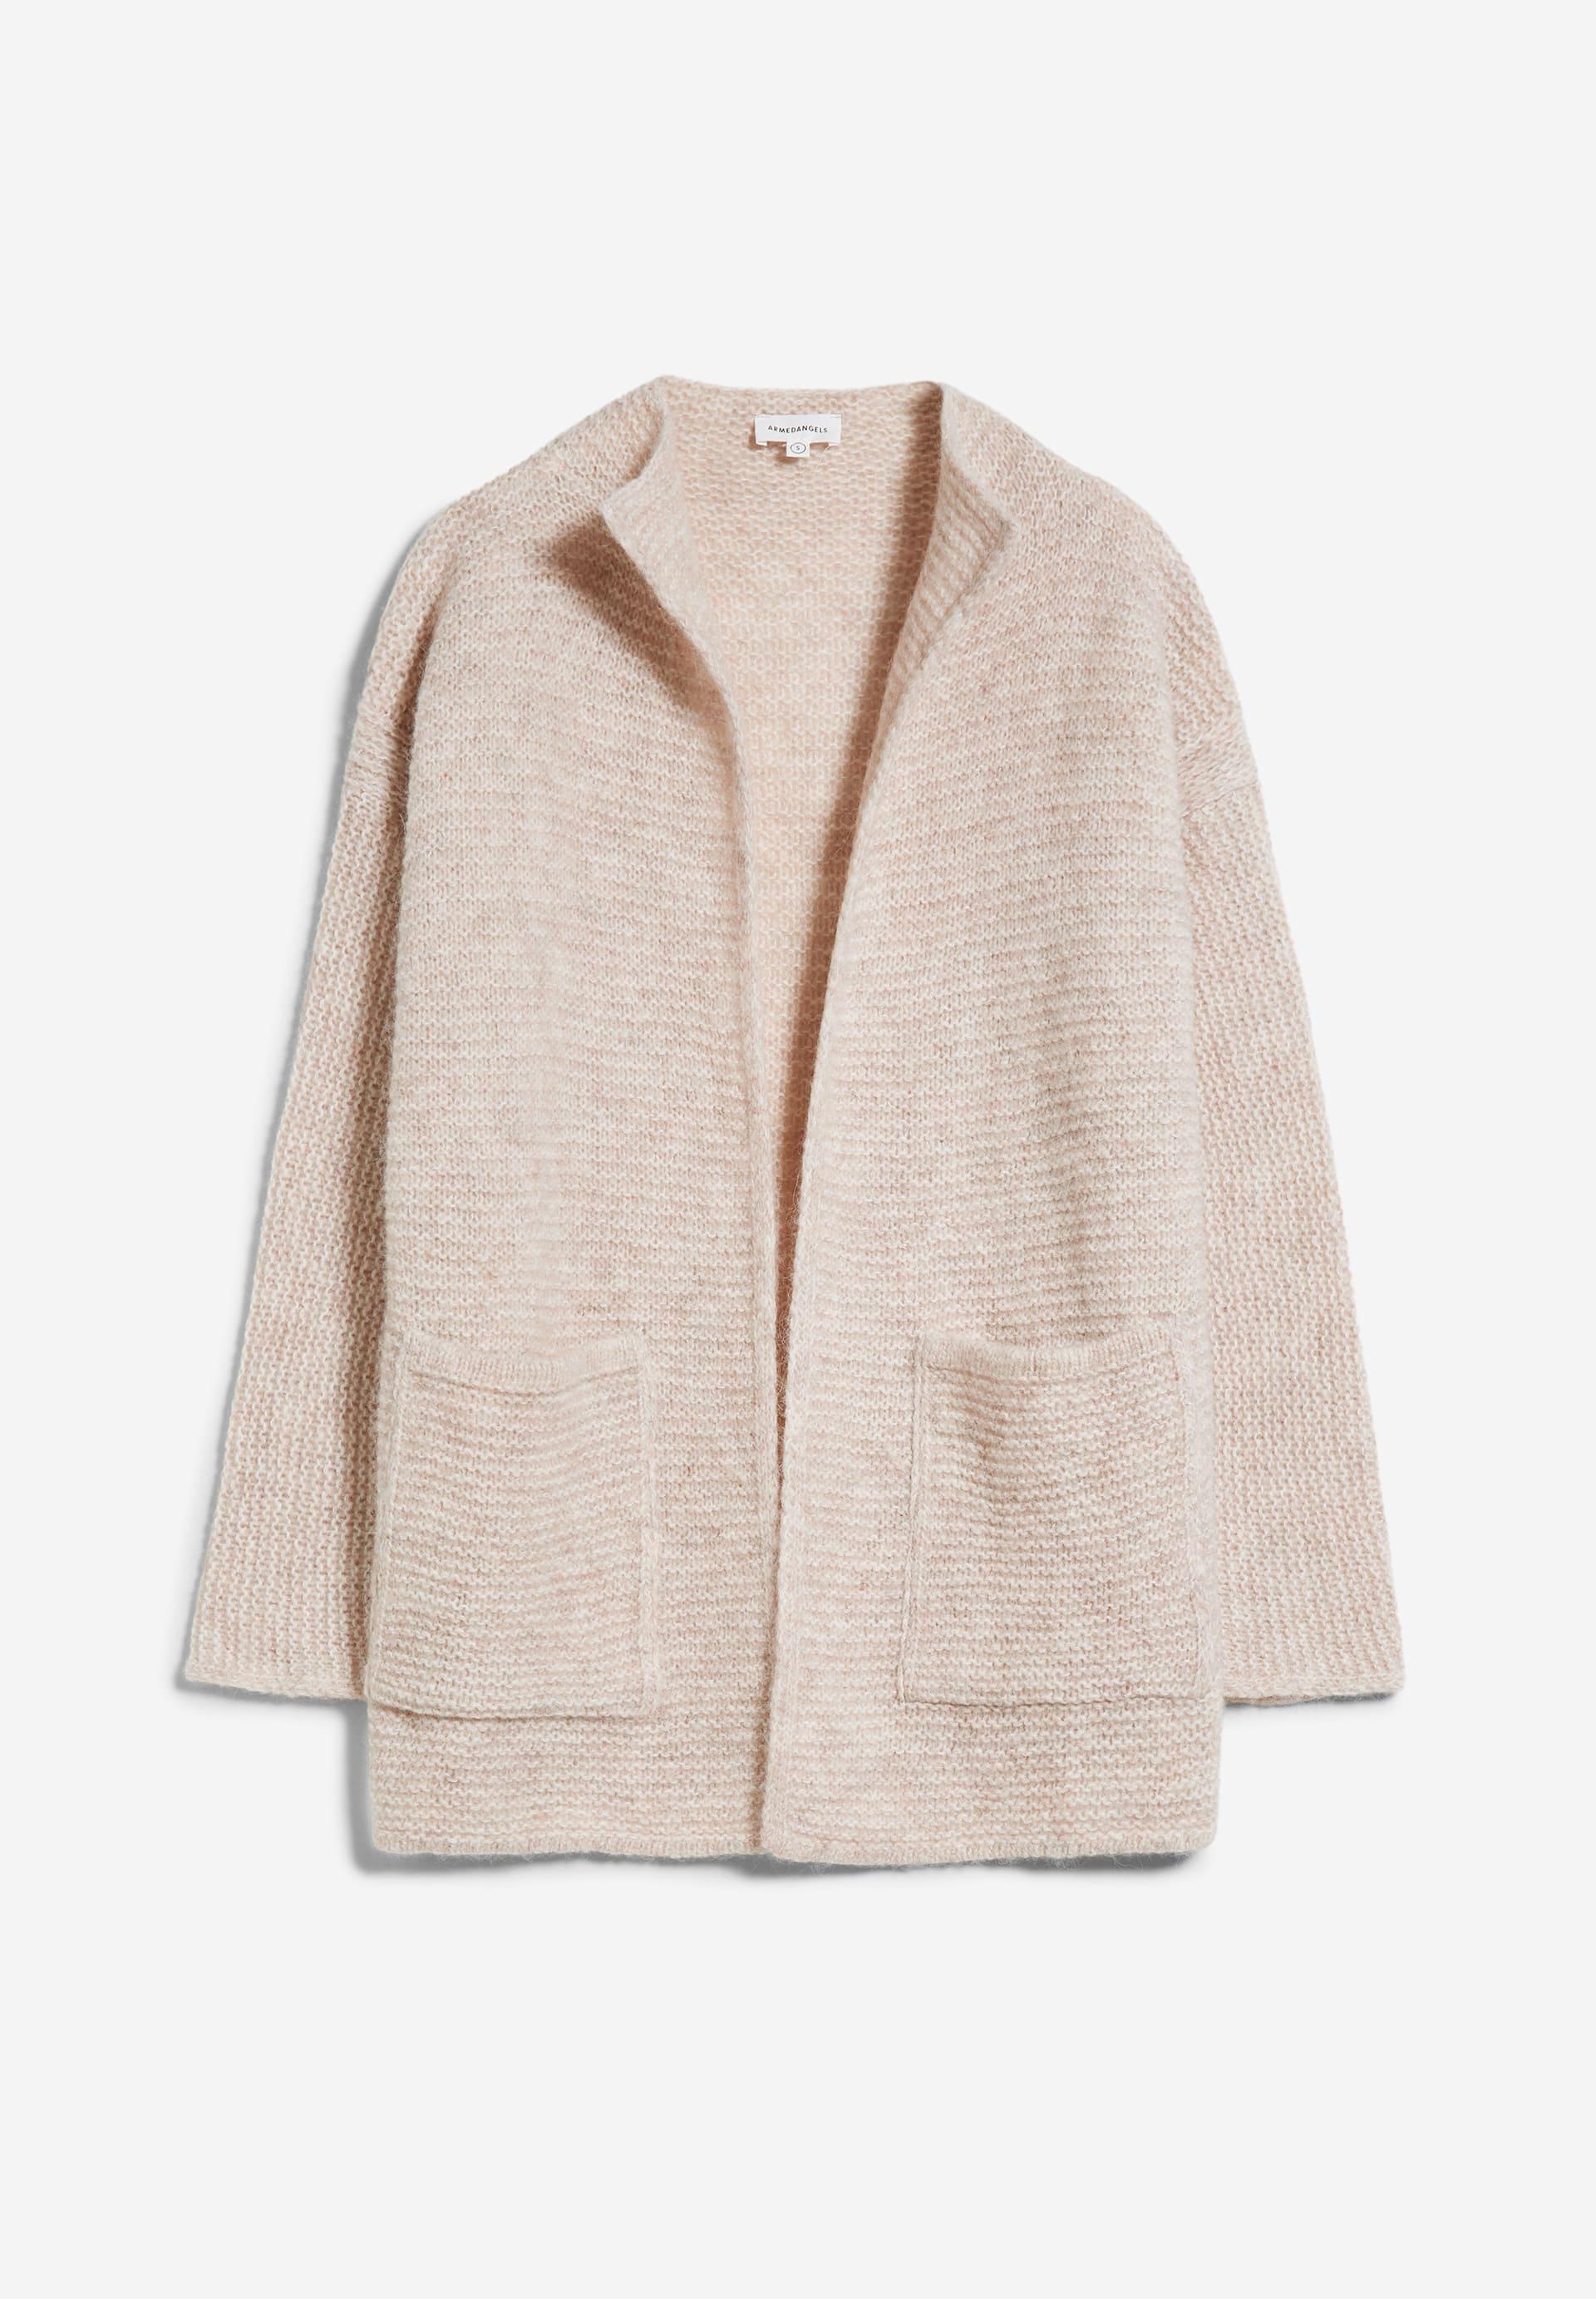 AINAA Cardigan made of Alpaca Wool Mix